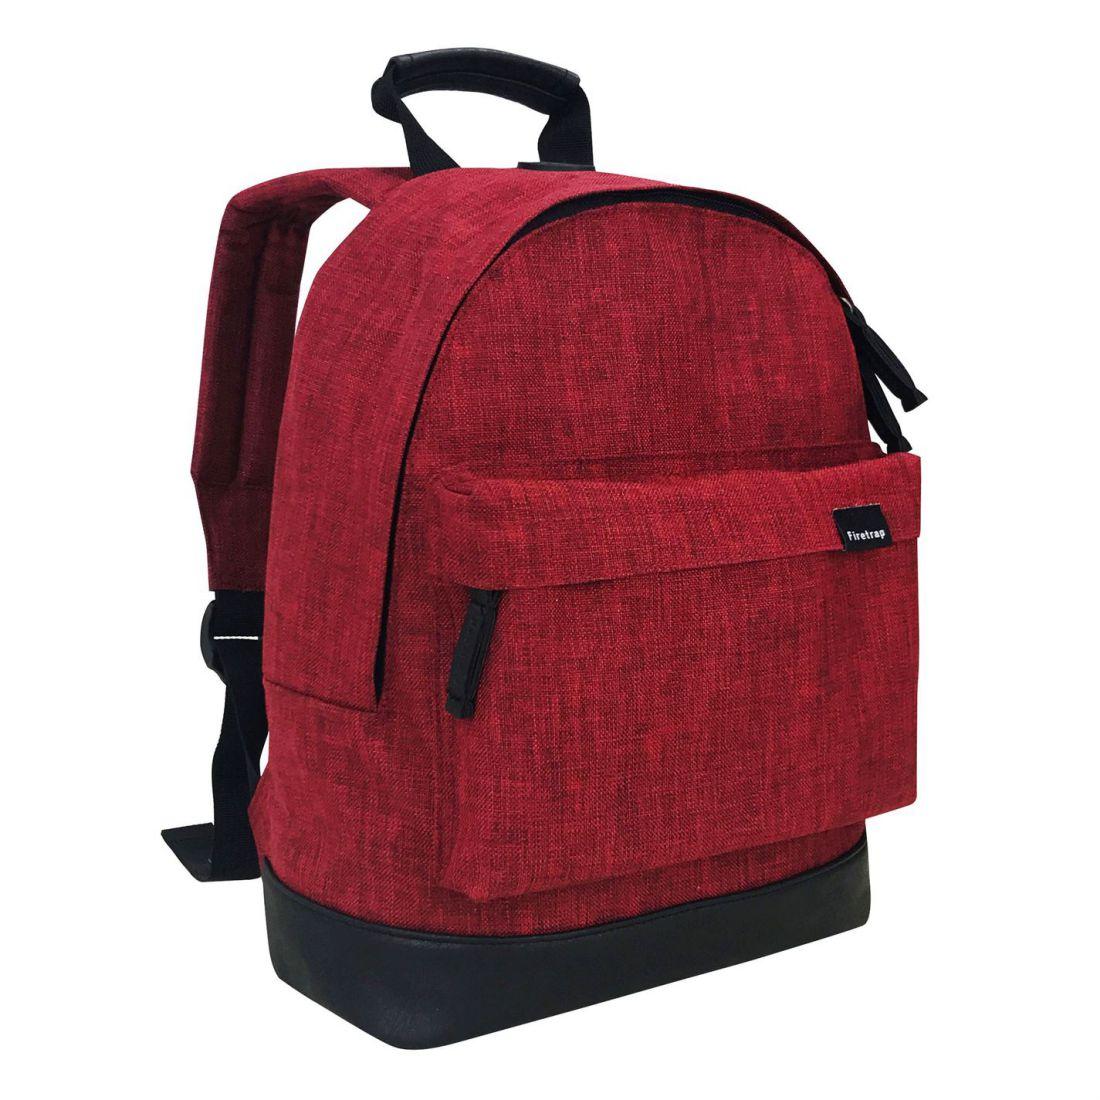 Firetrap Mini Backpack Rucksack Sports Casual Travel Luggage Accessory